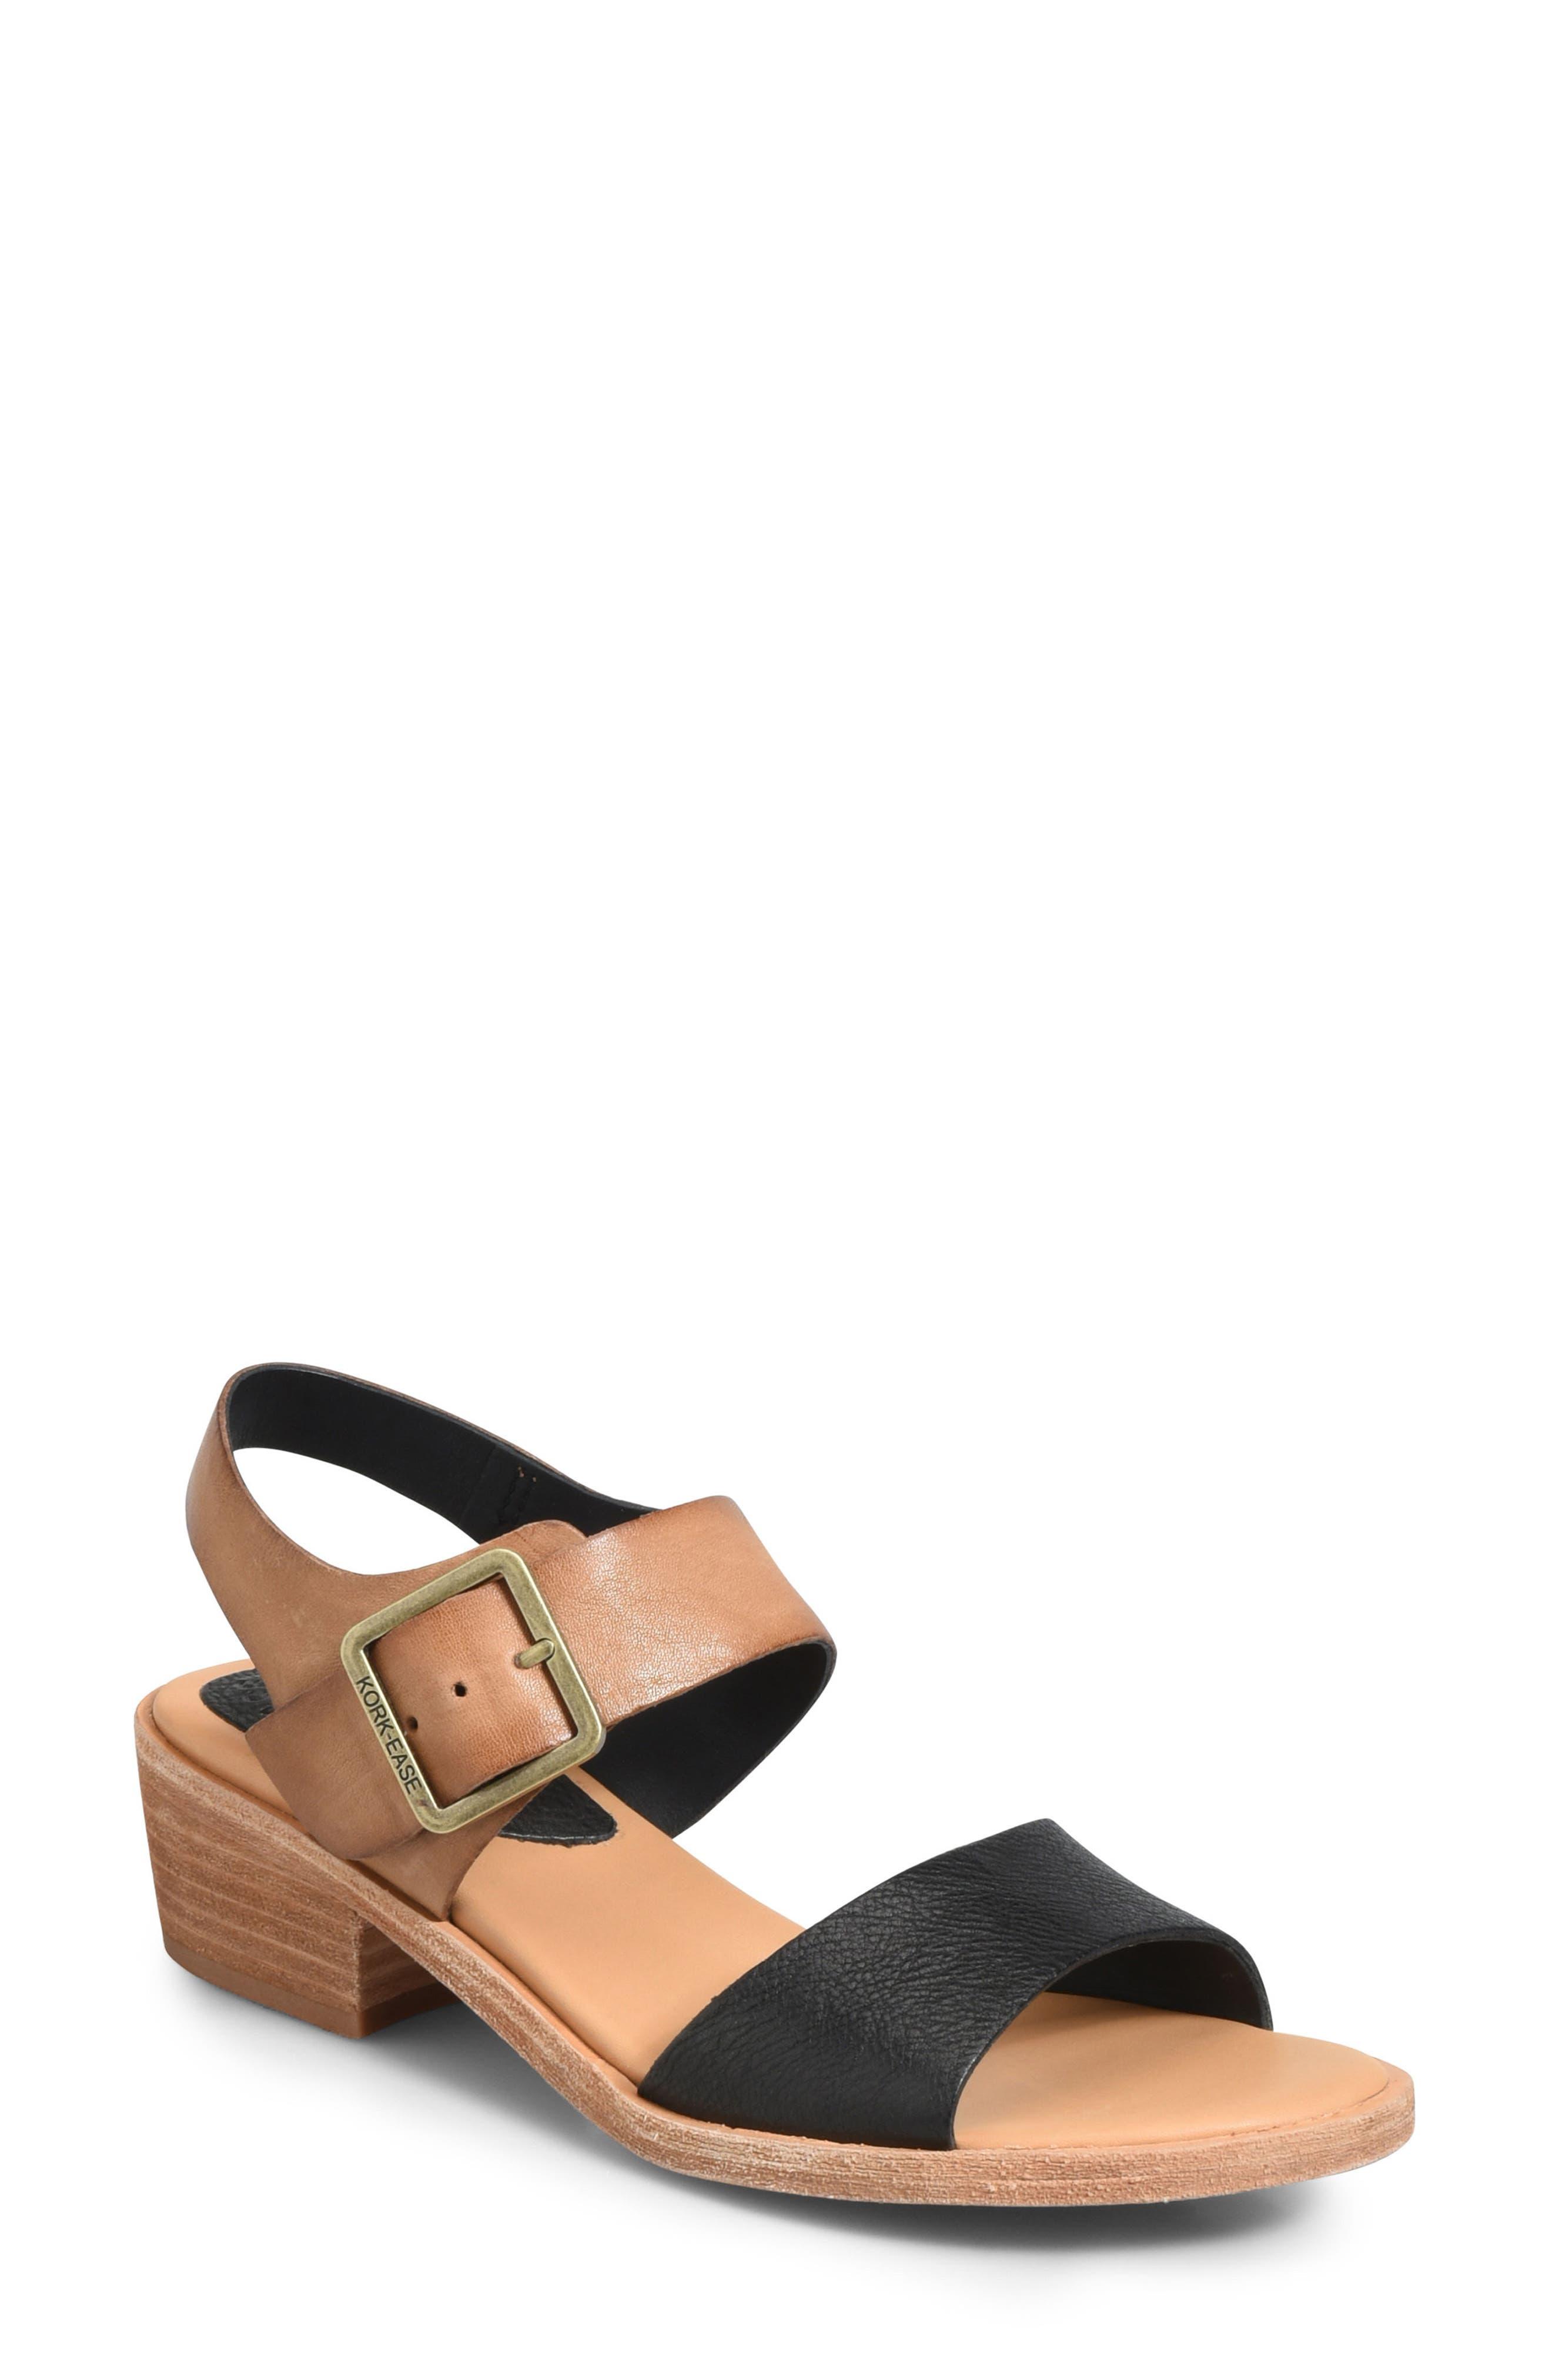 Myakka Sandal,                         Main,                         color, BLACK/ LIGHT BROWN LEATHER